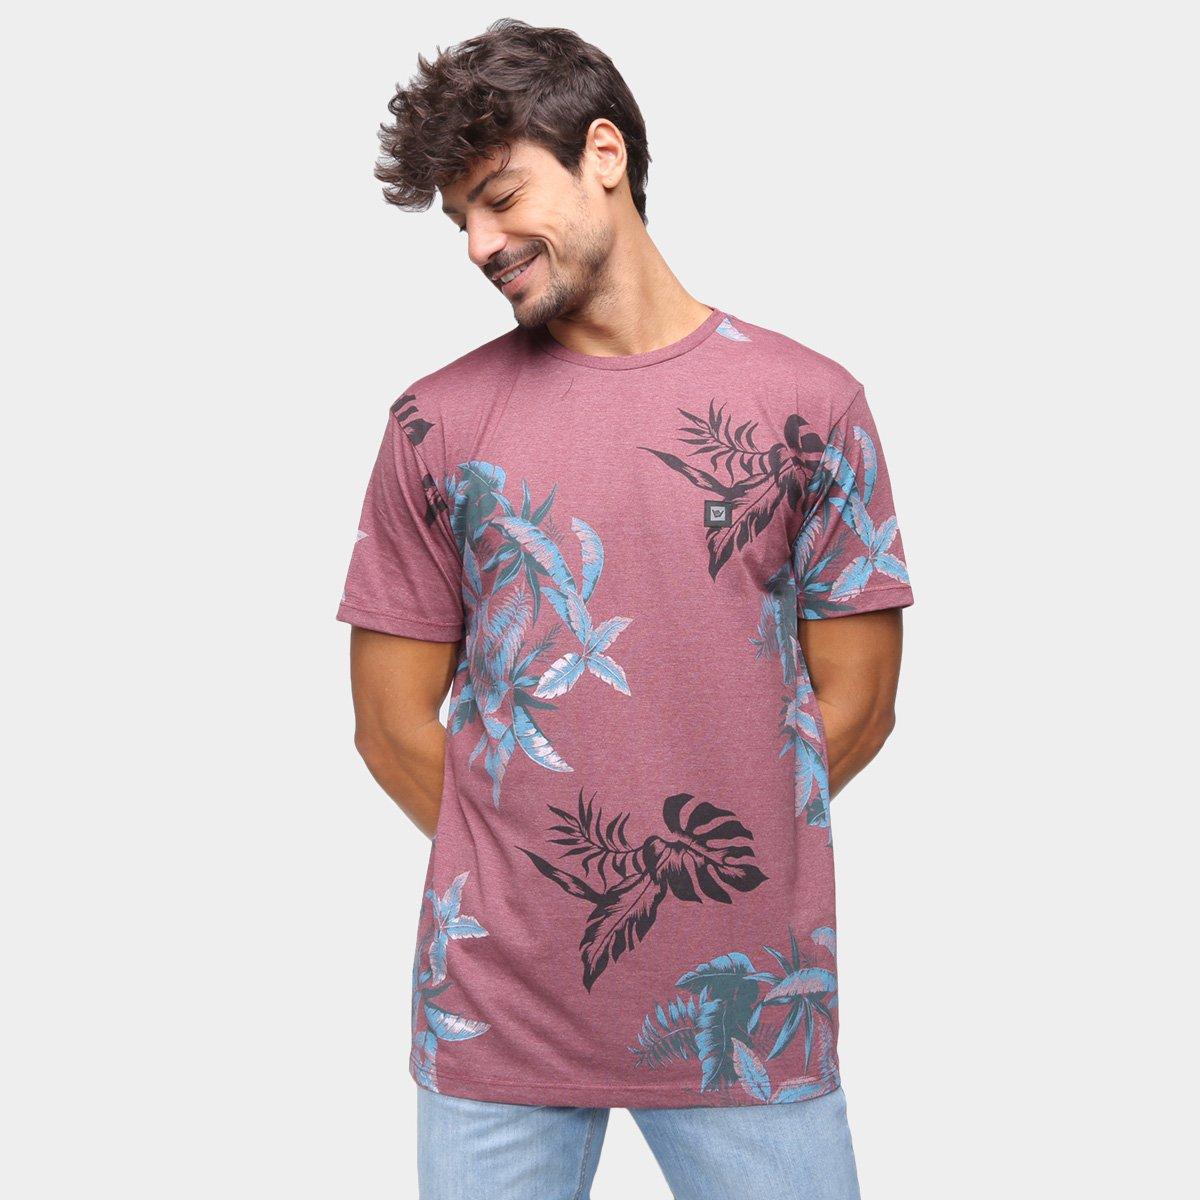 Camiseta Hang Loose Especial Leaves Masculina